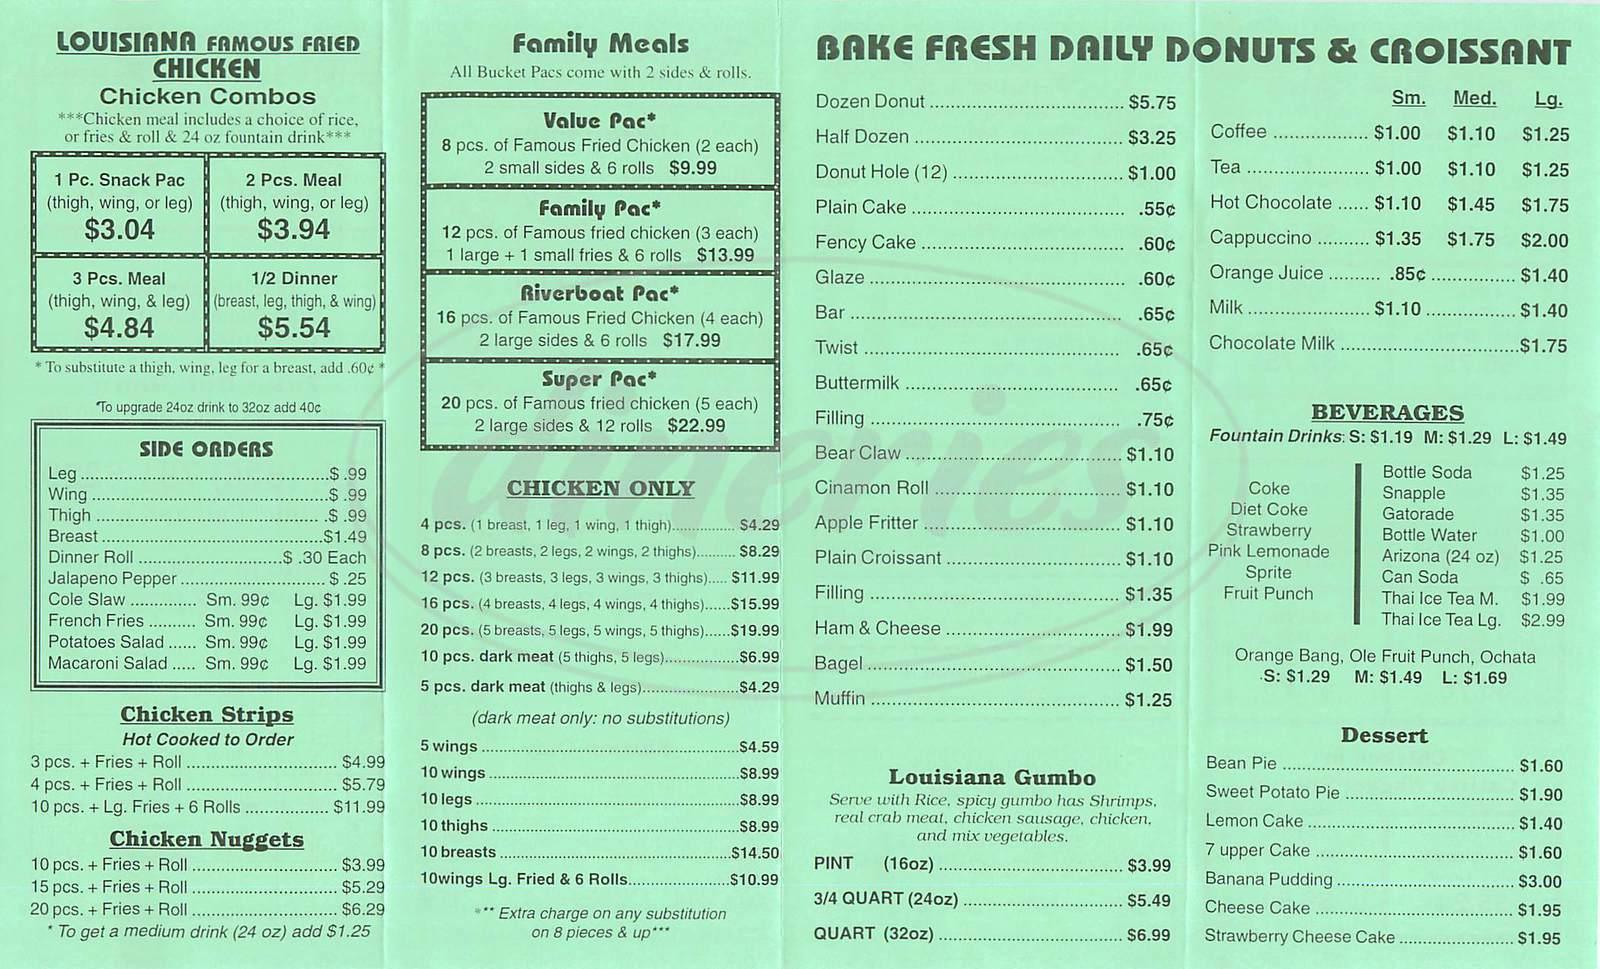 menu for Louisiana Famous Fried Chicken